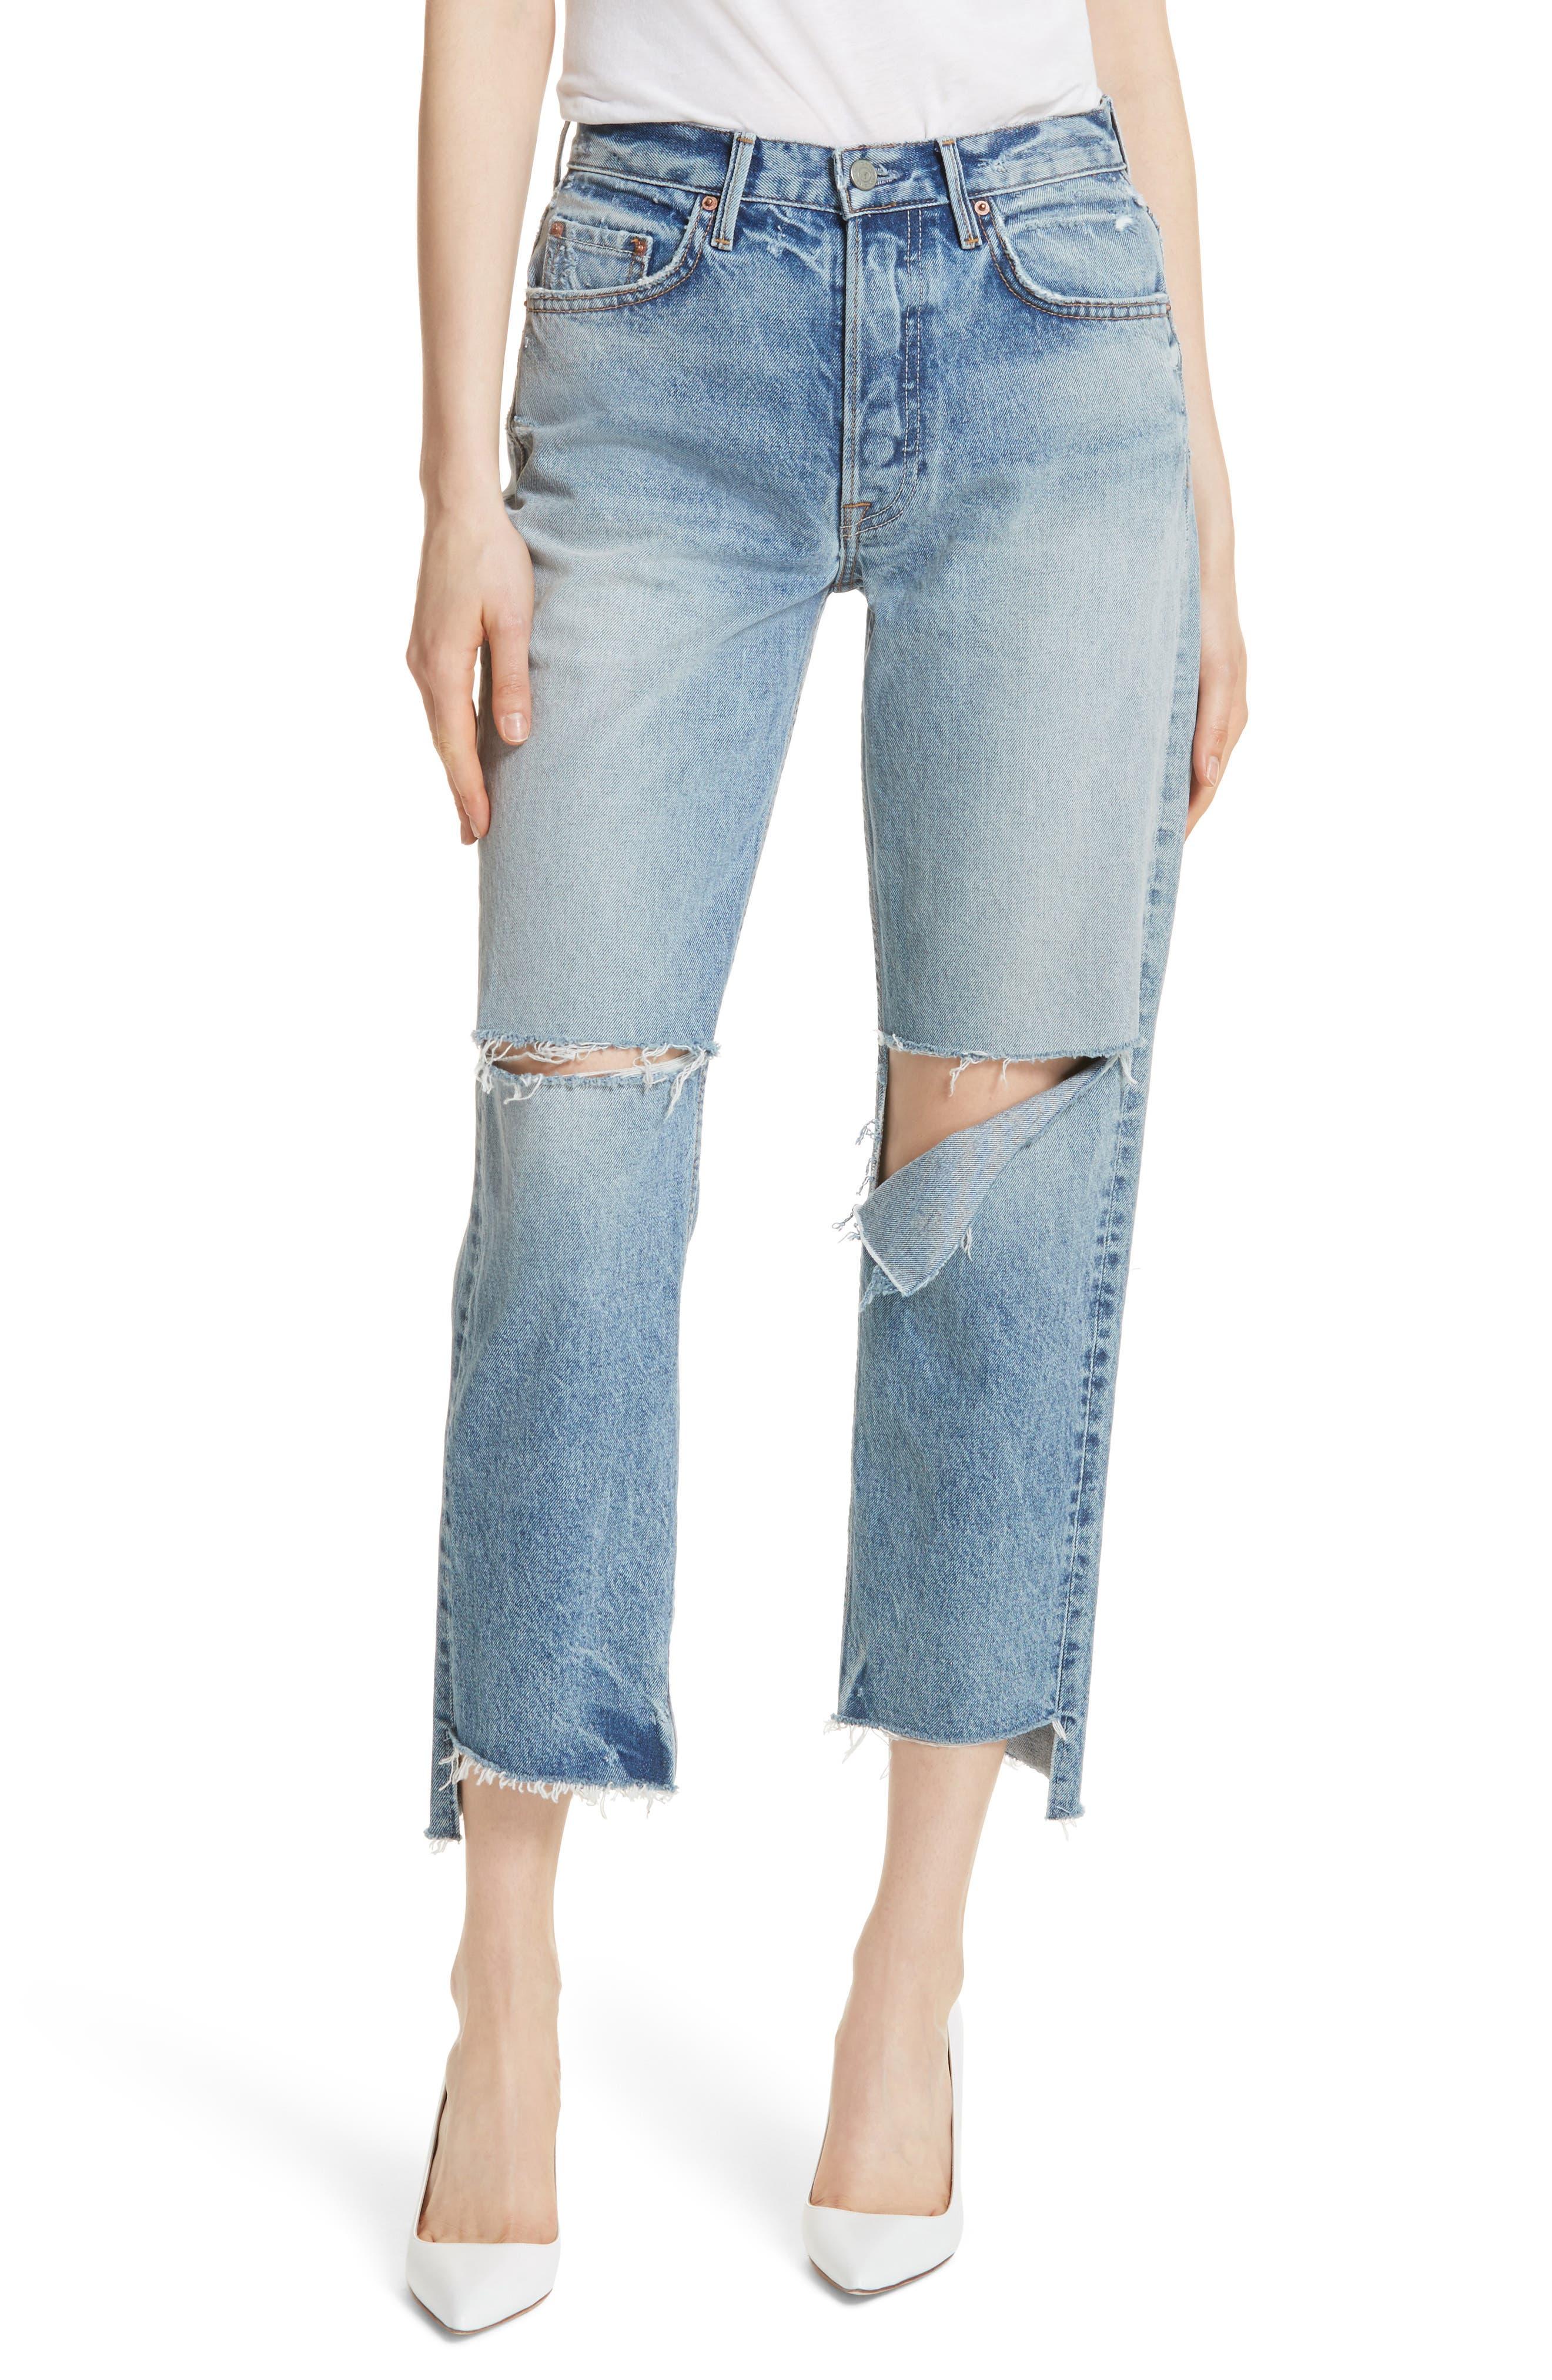 GRLFRND Helena Ripped Rigid High Waist Straight Jeans (All Cut Up)